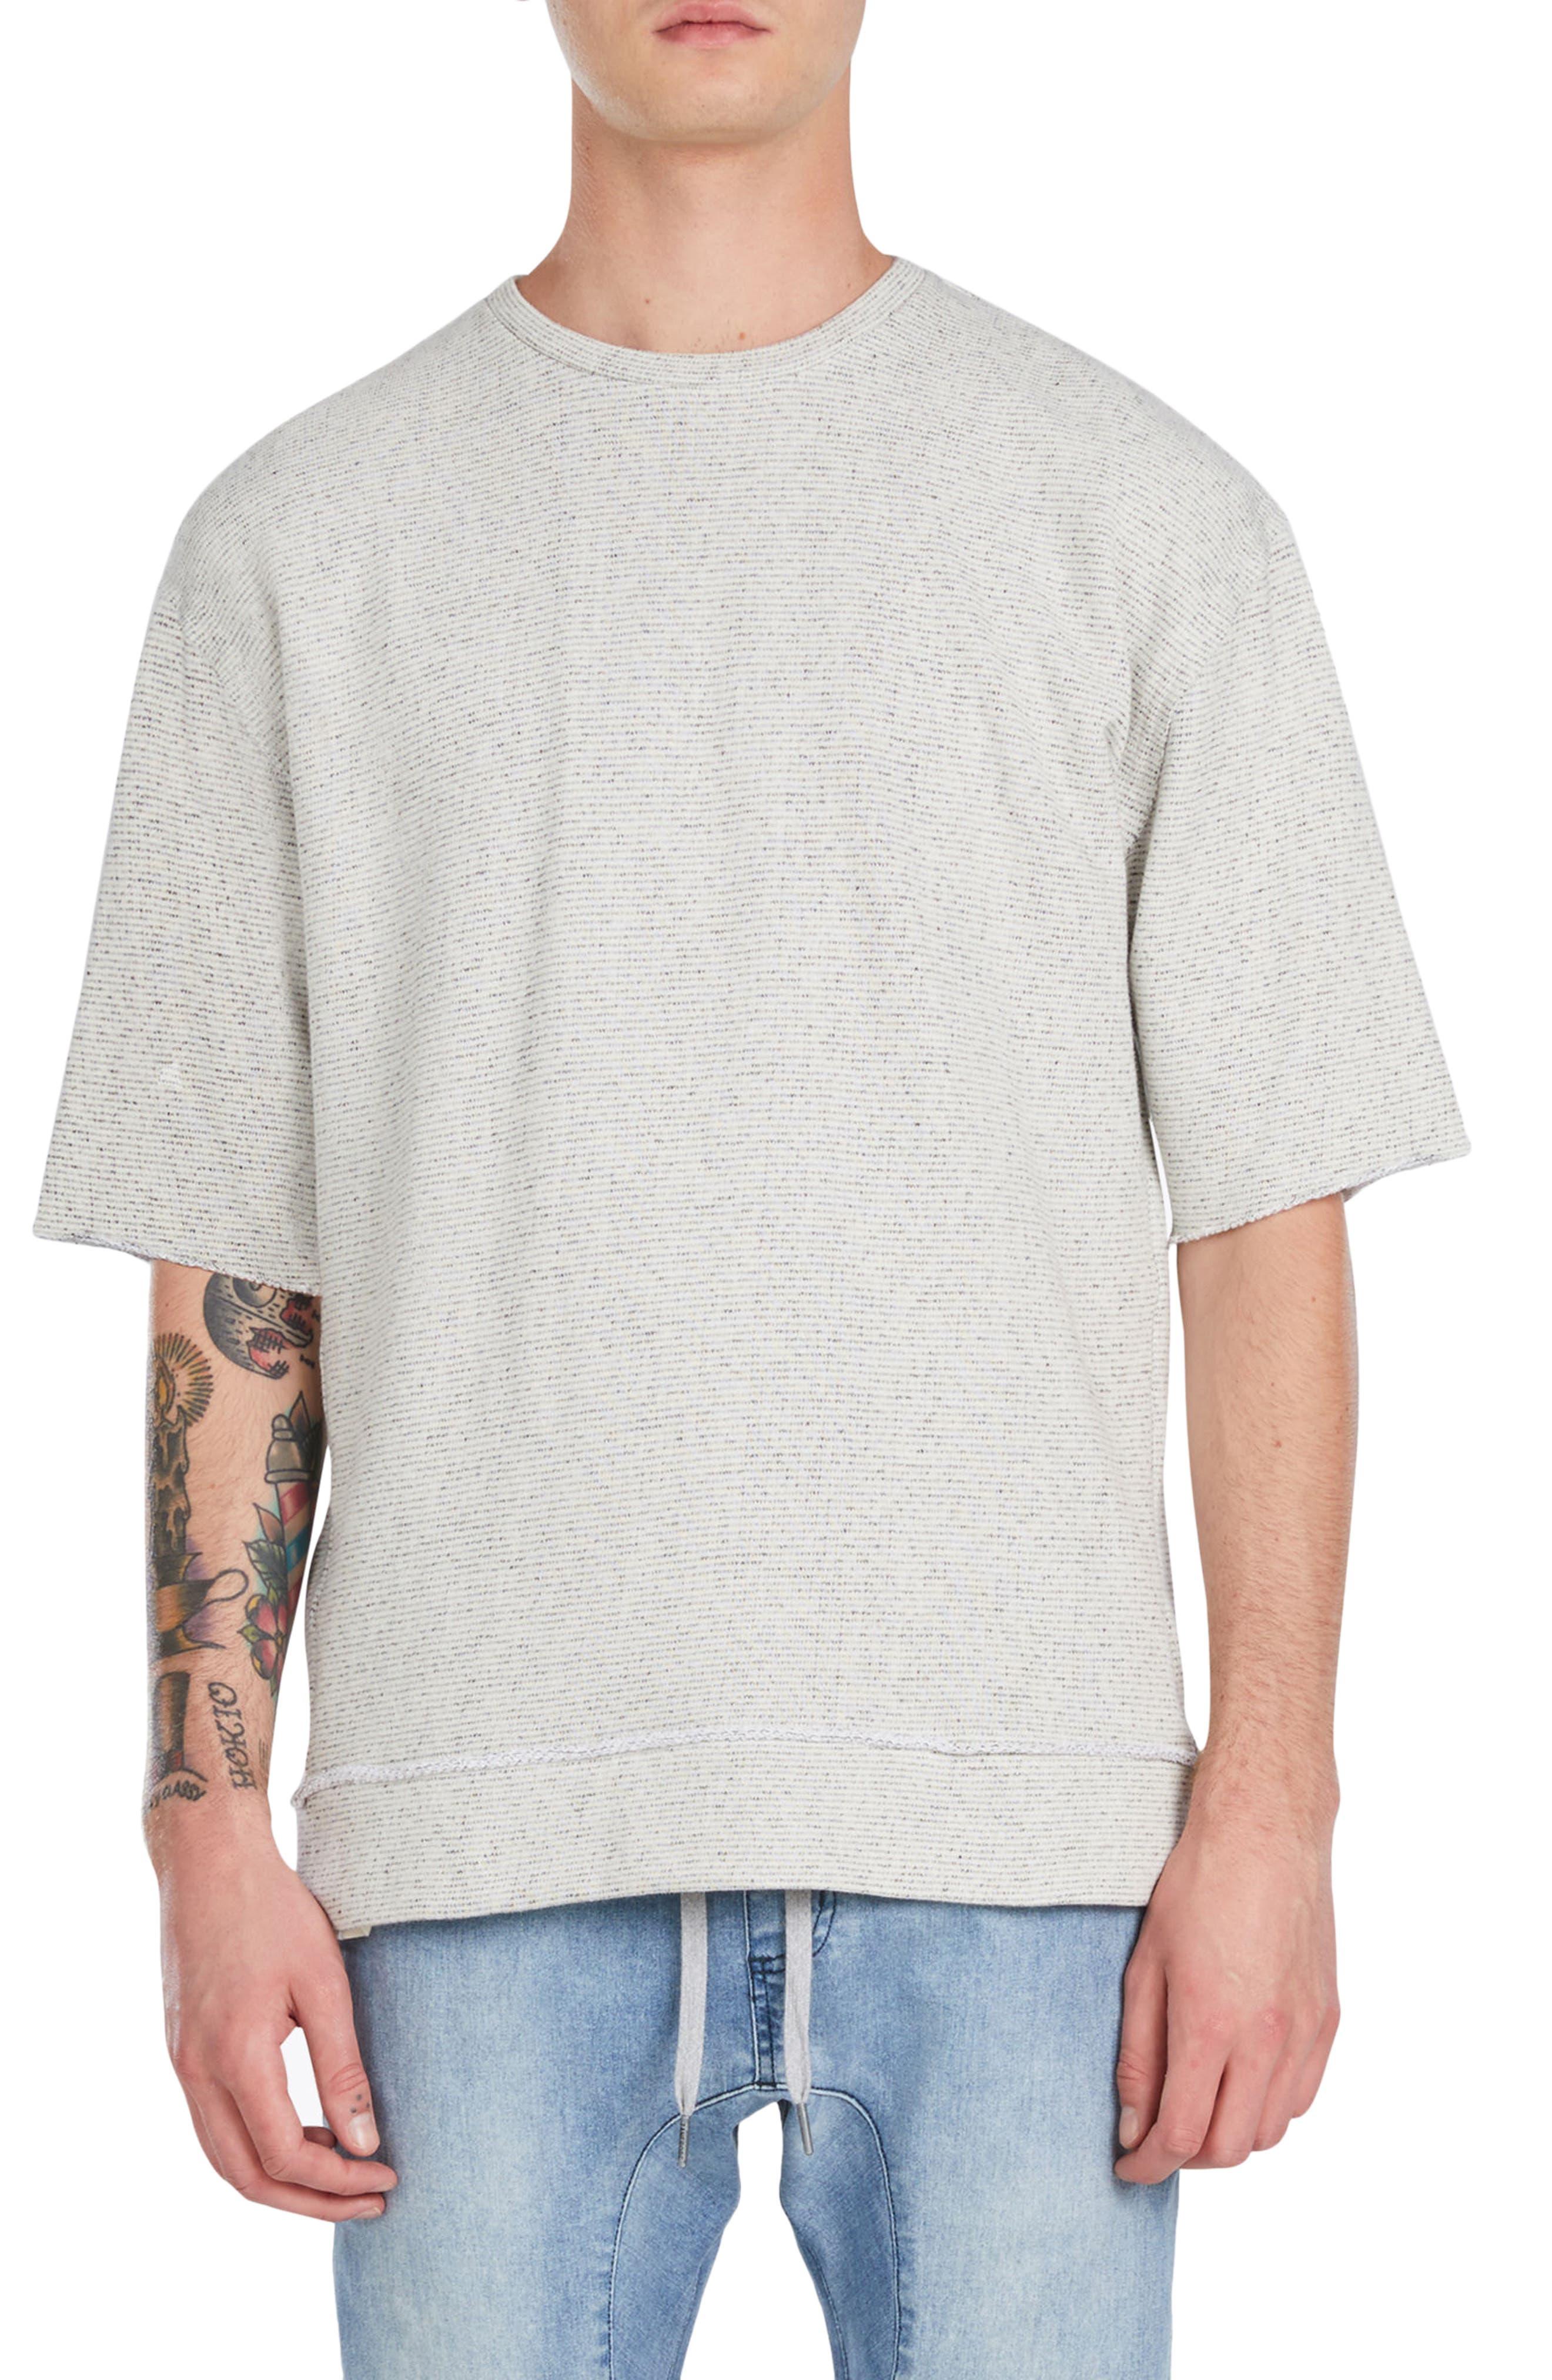 Rugger Oversize Half Sleeve Sweatshirt,                             Main thumbnail 1, color,                             251